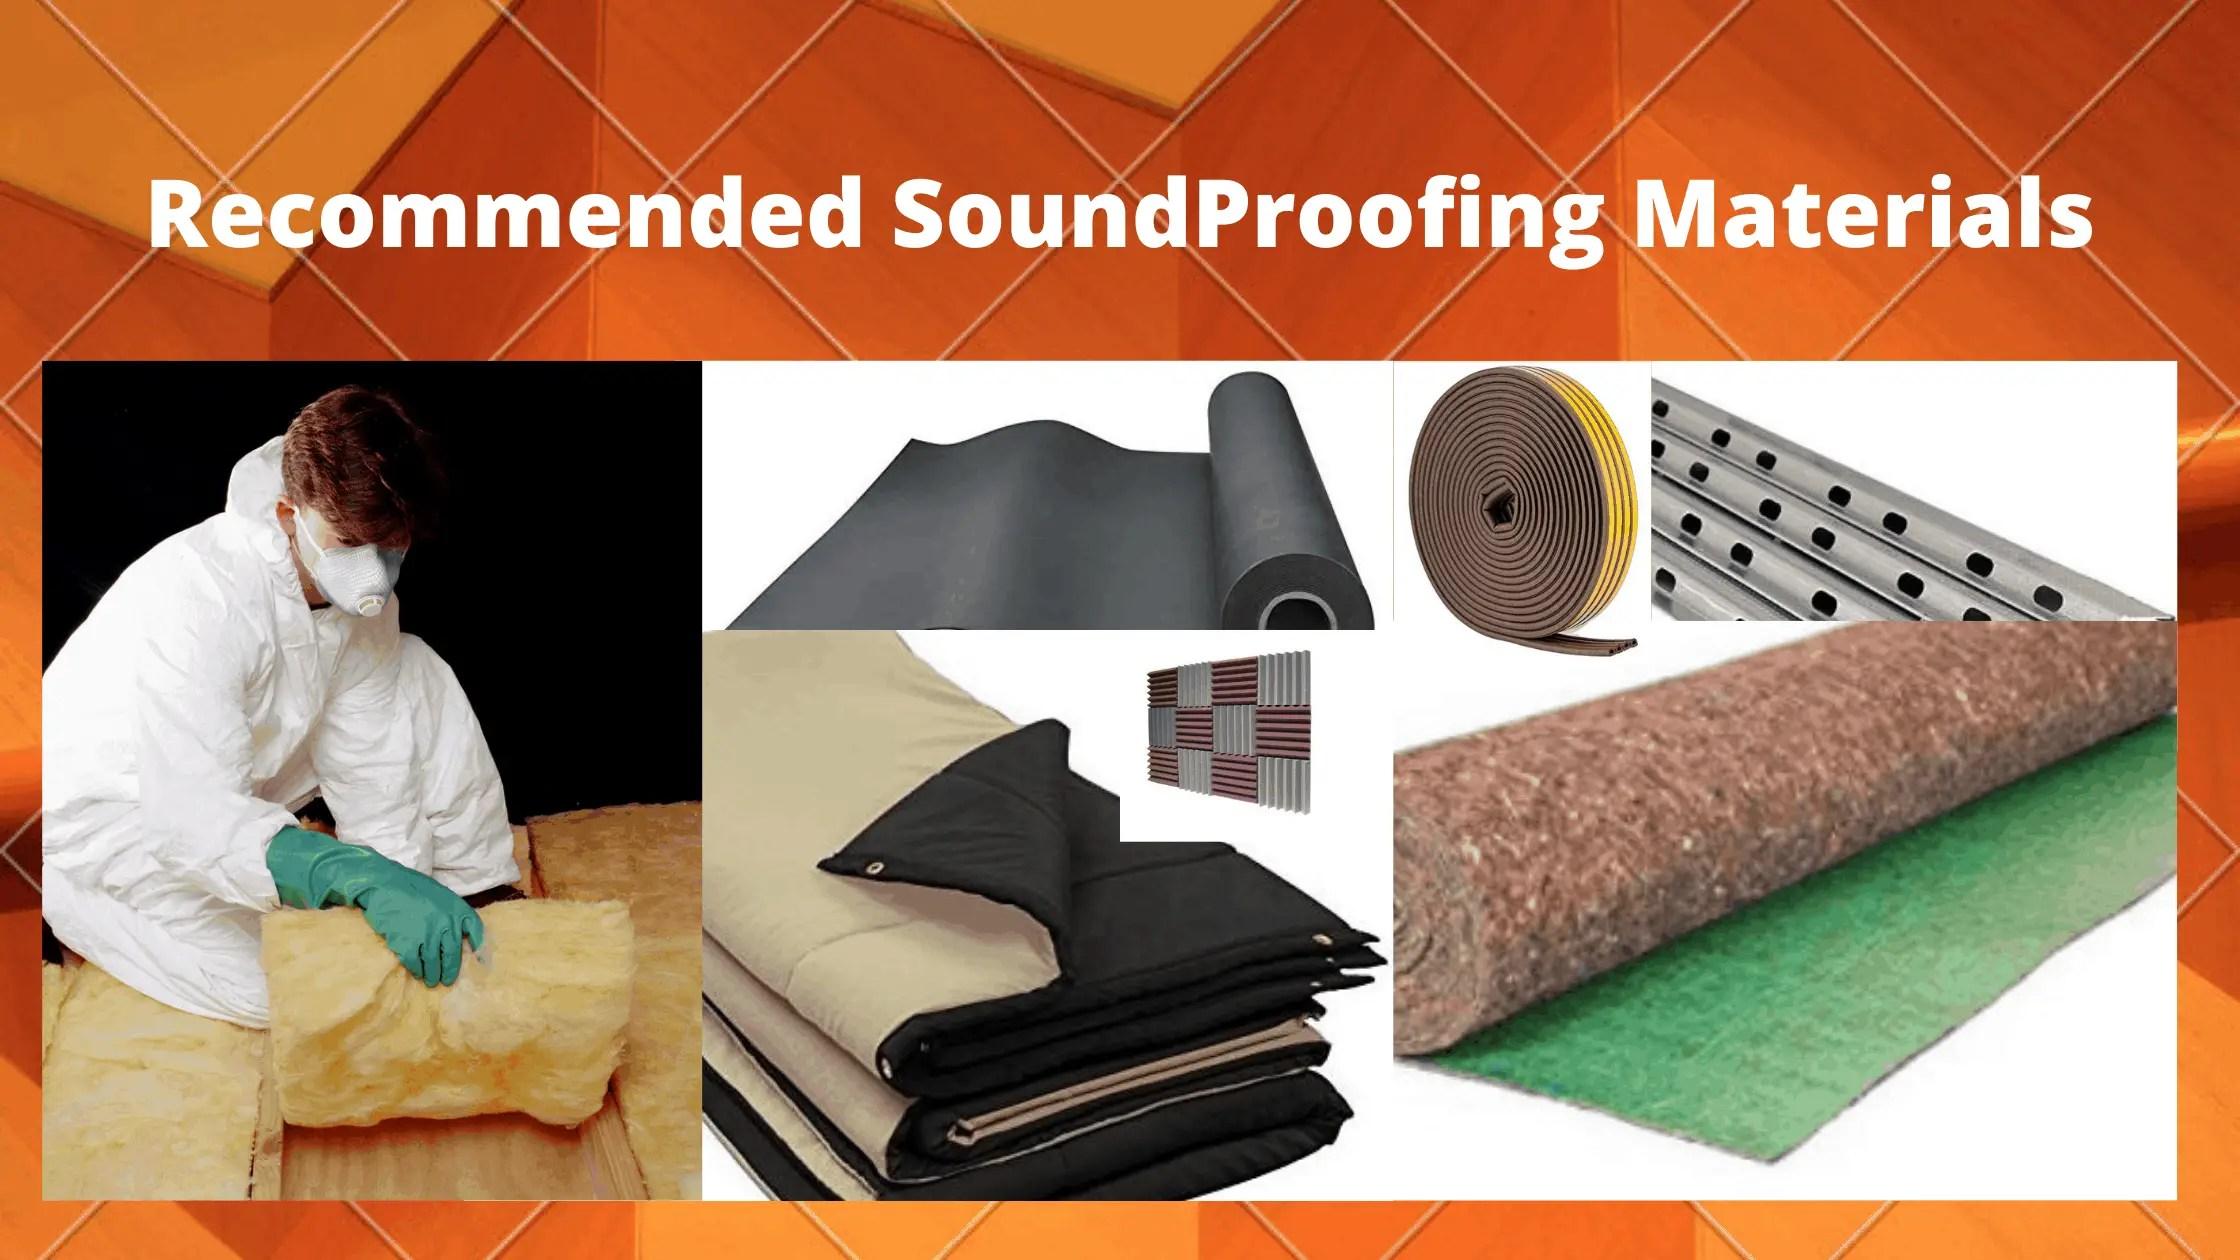 Best soundproofing materials